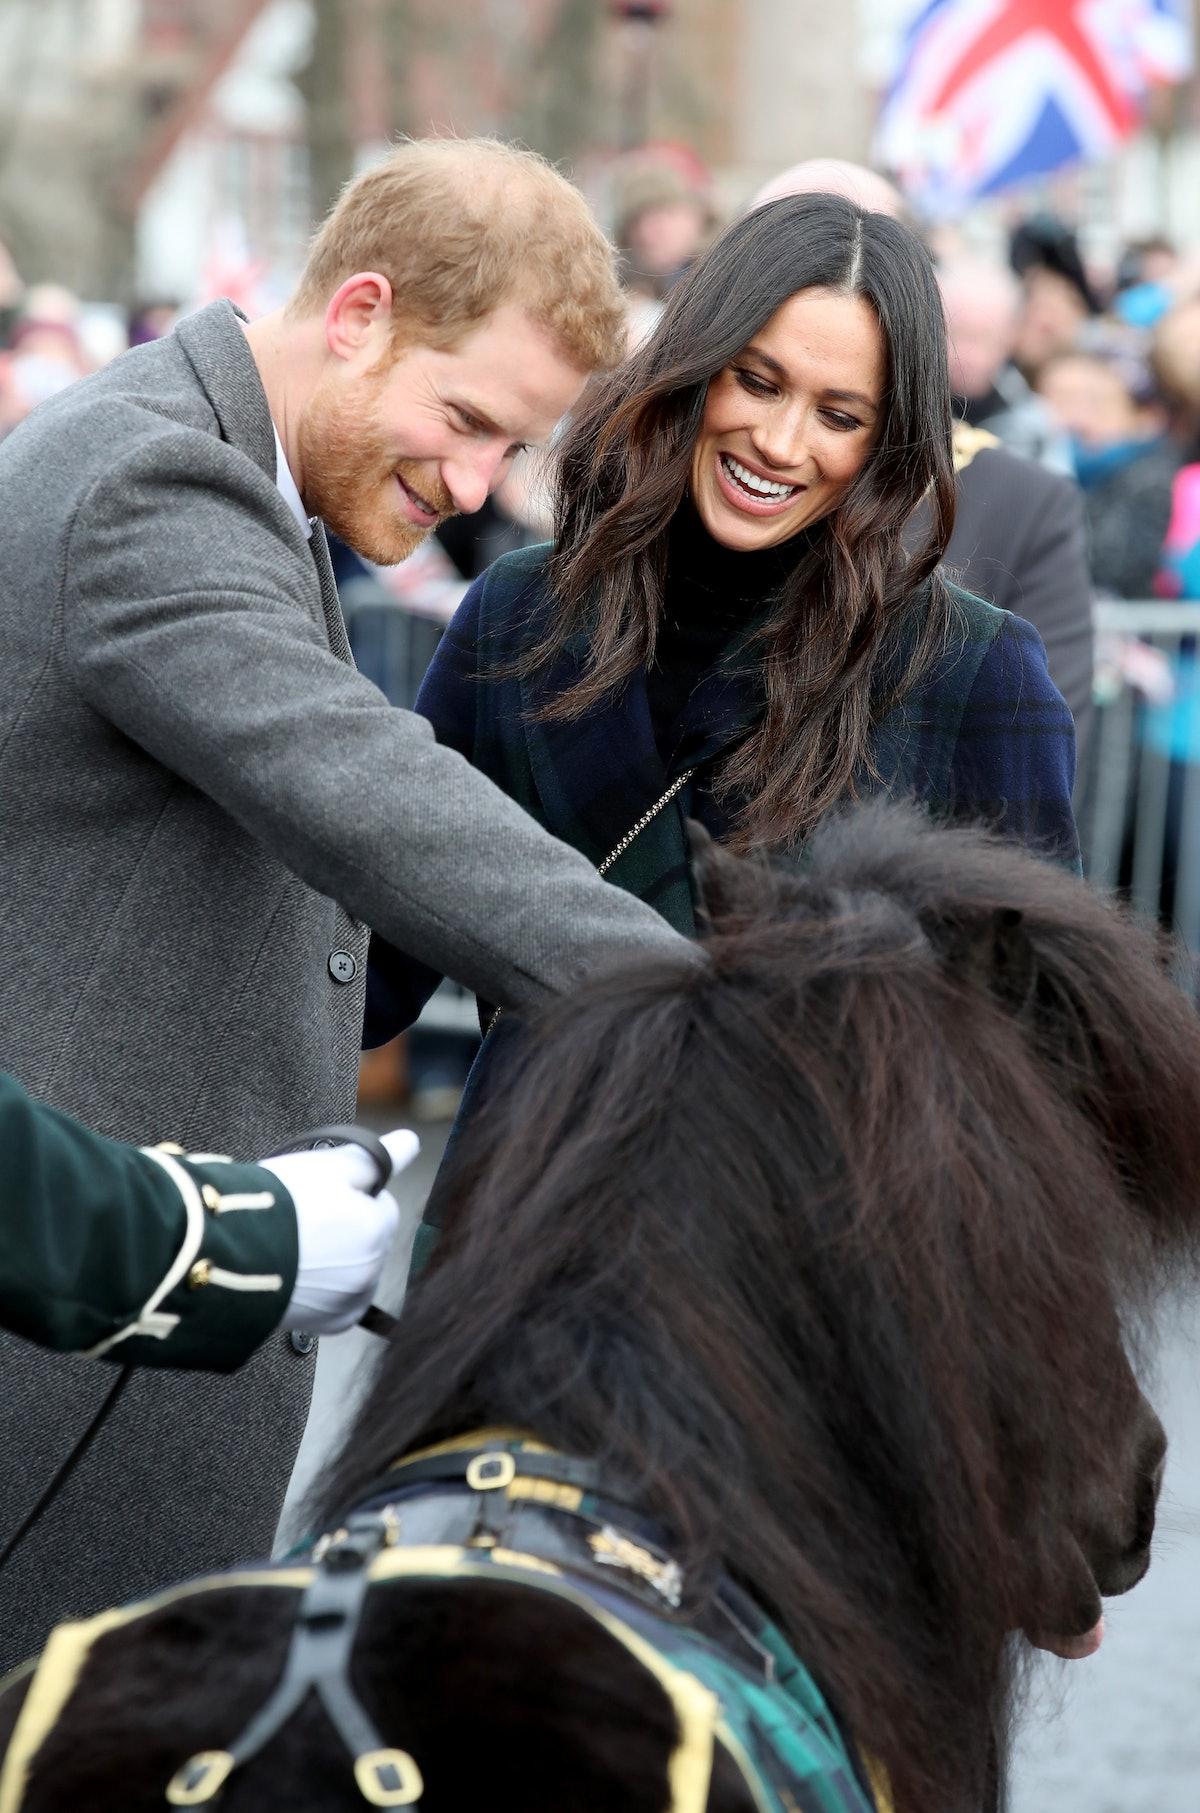 prince-harry-meghan-markle-pony-scottland-visit-01.jpg